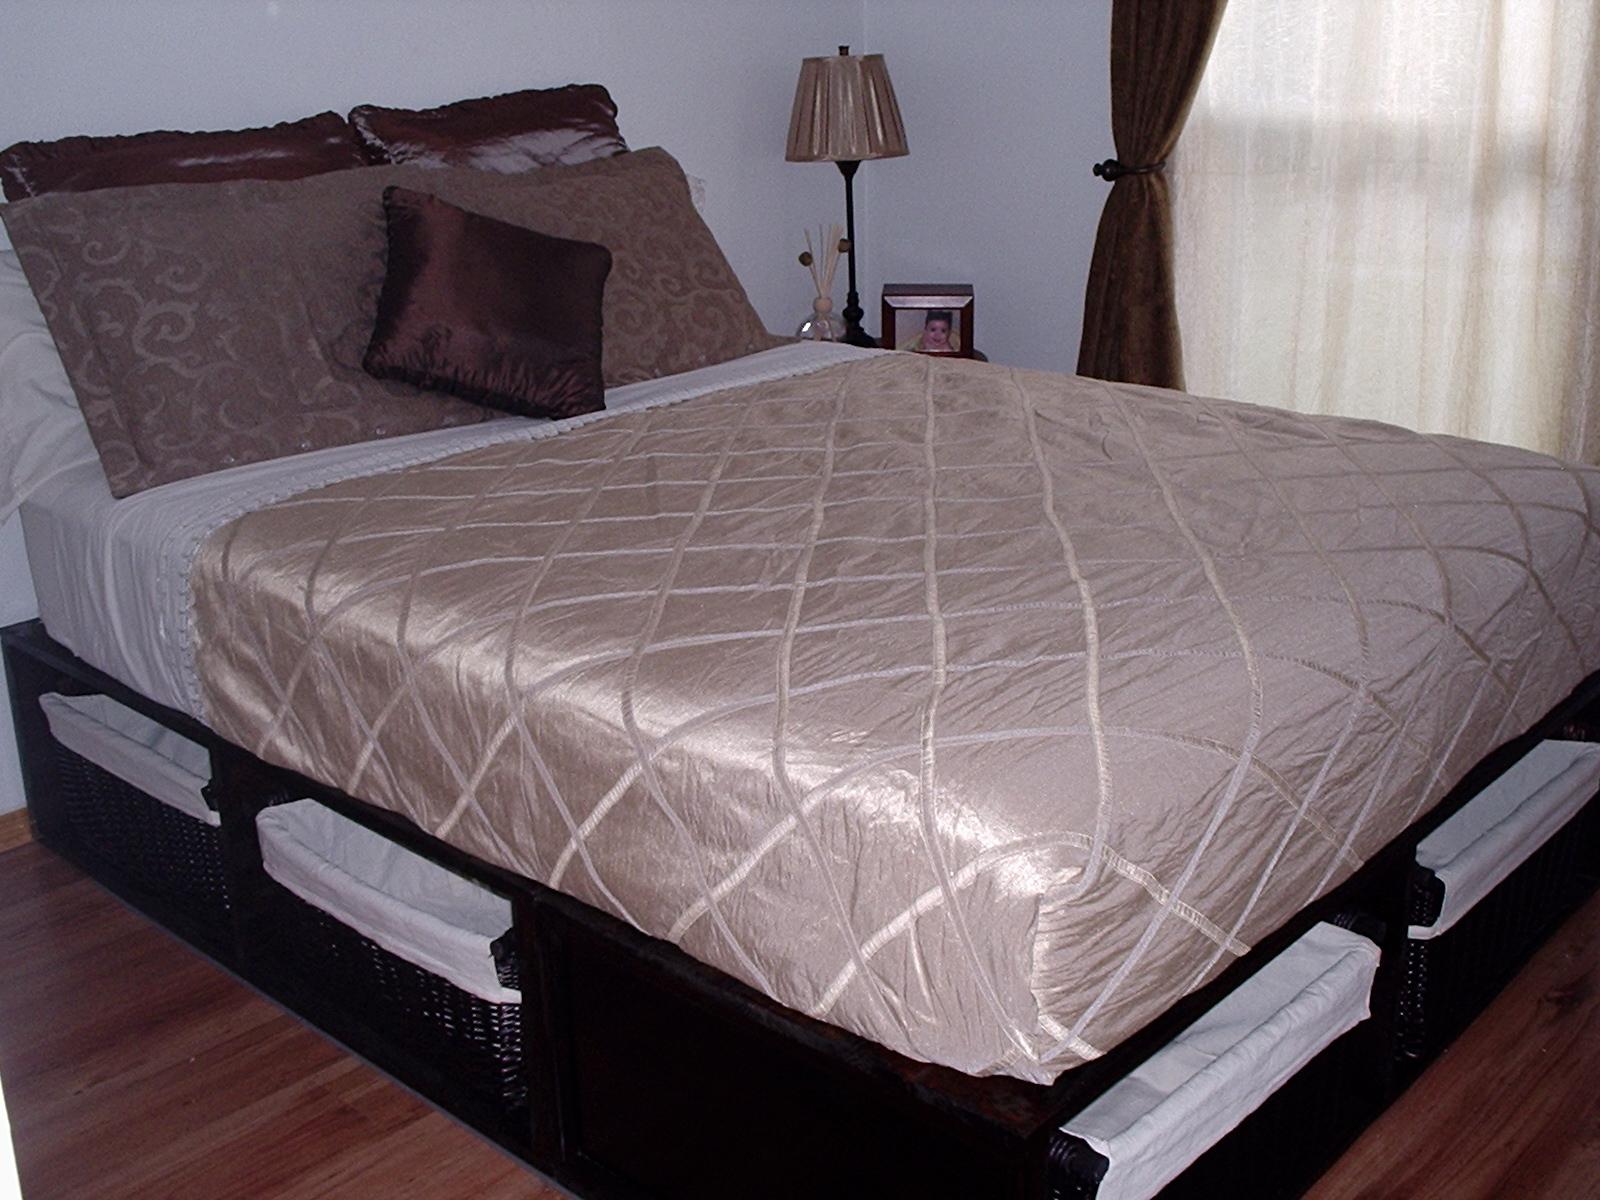 Galicia 39 s shop base de cama hecha por mi - Bases de cama ...